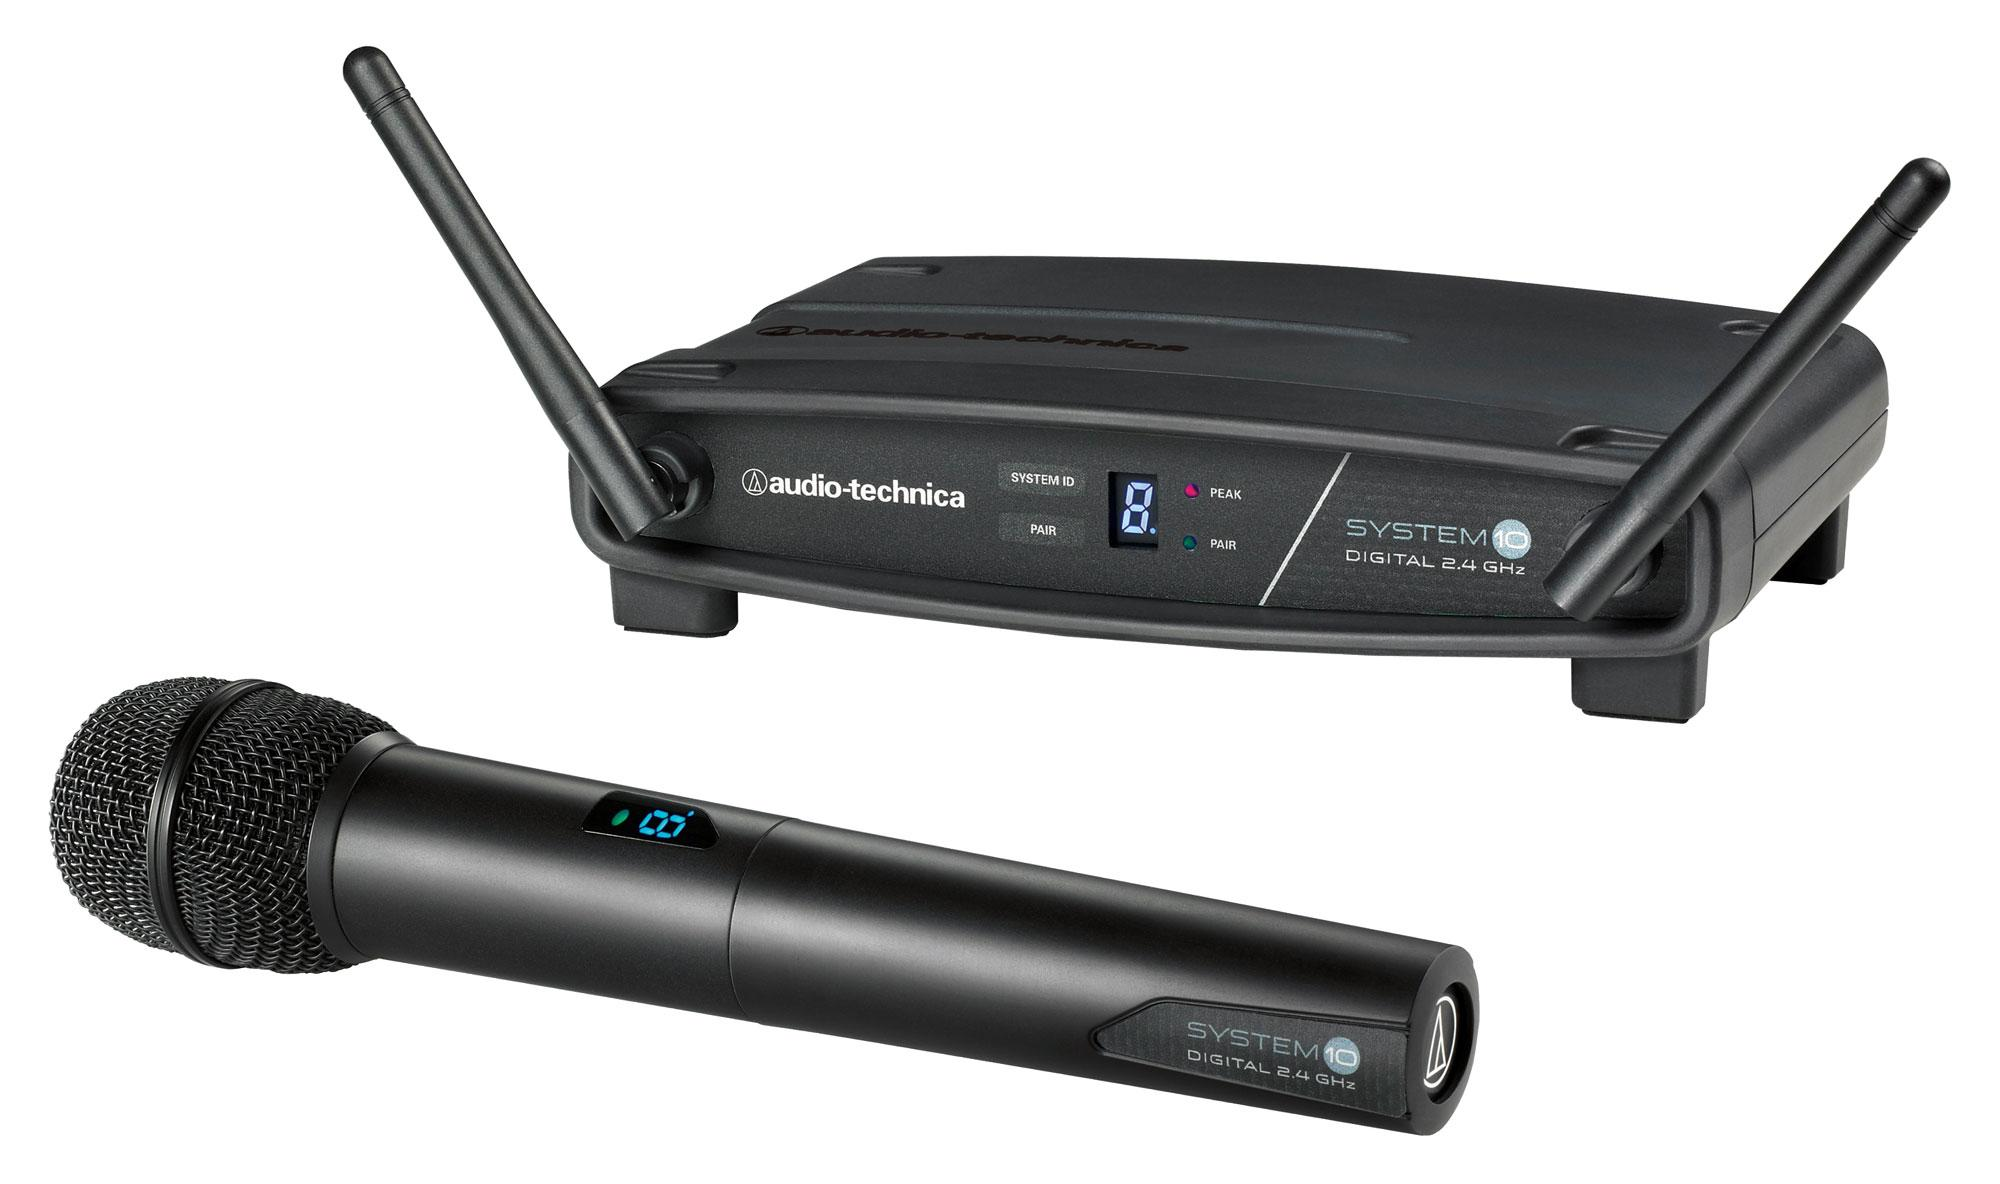 Drahtlossysteme - Audio Technica ATW 1102 Handheld Funkset - Onlineshop Musikhaus Kirstein